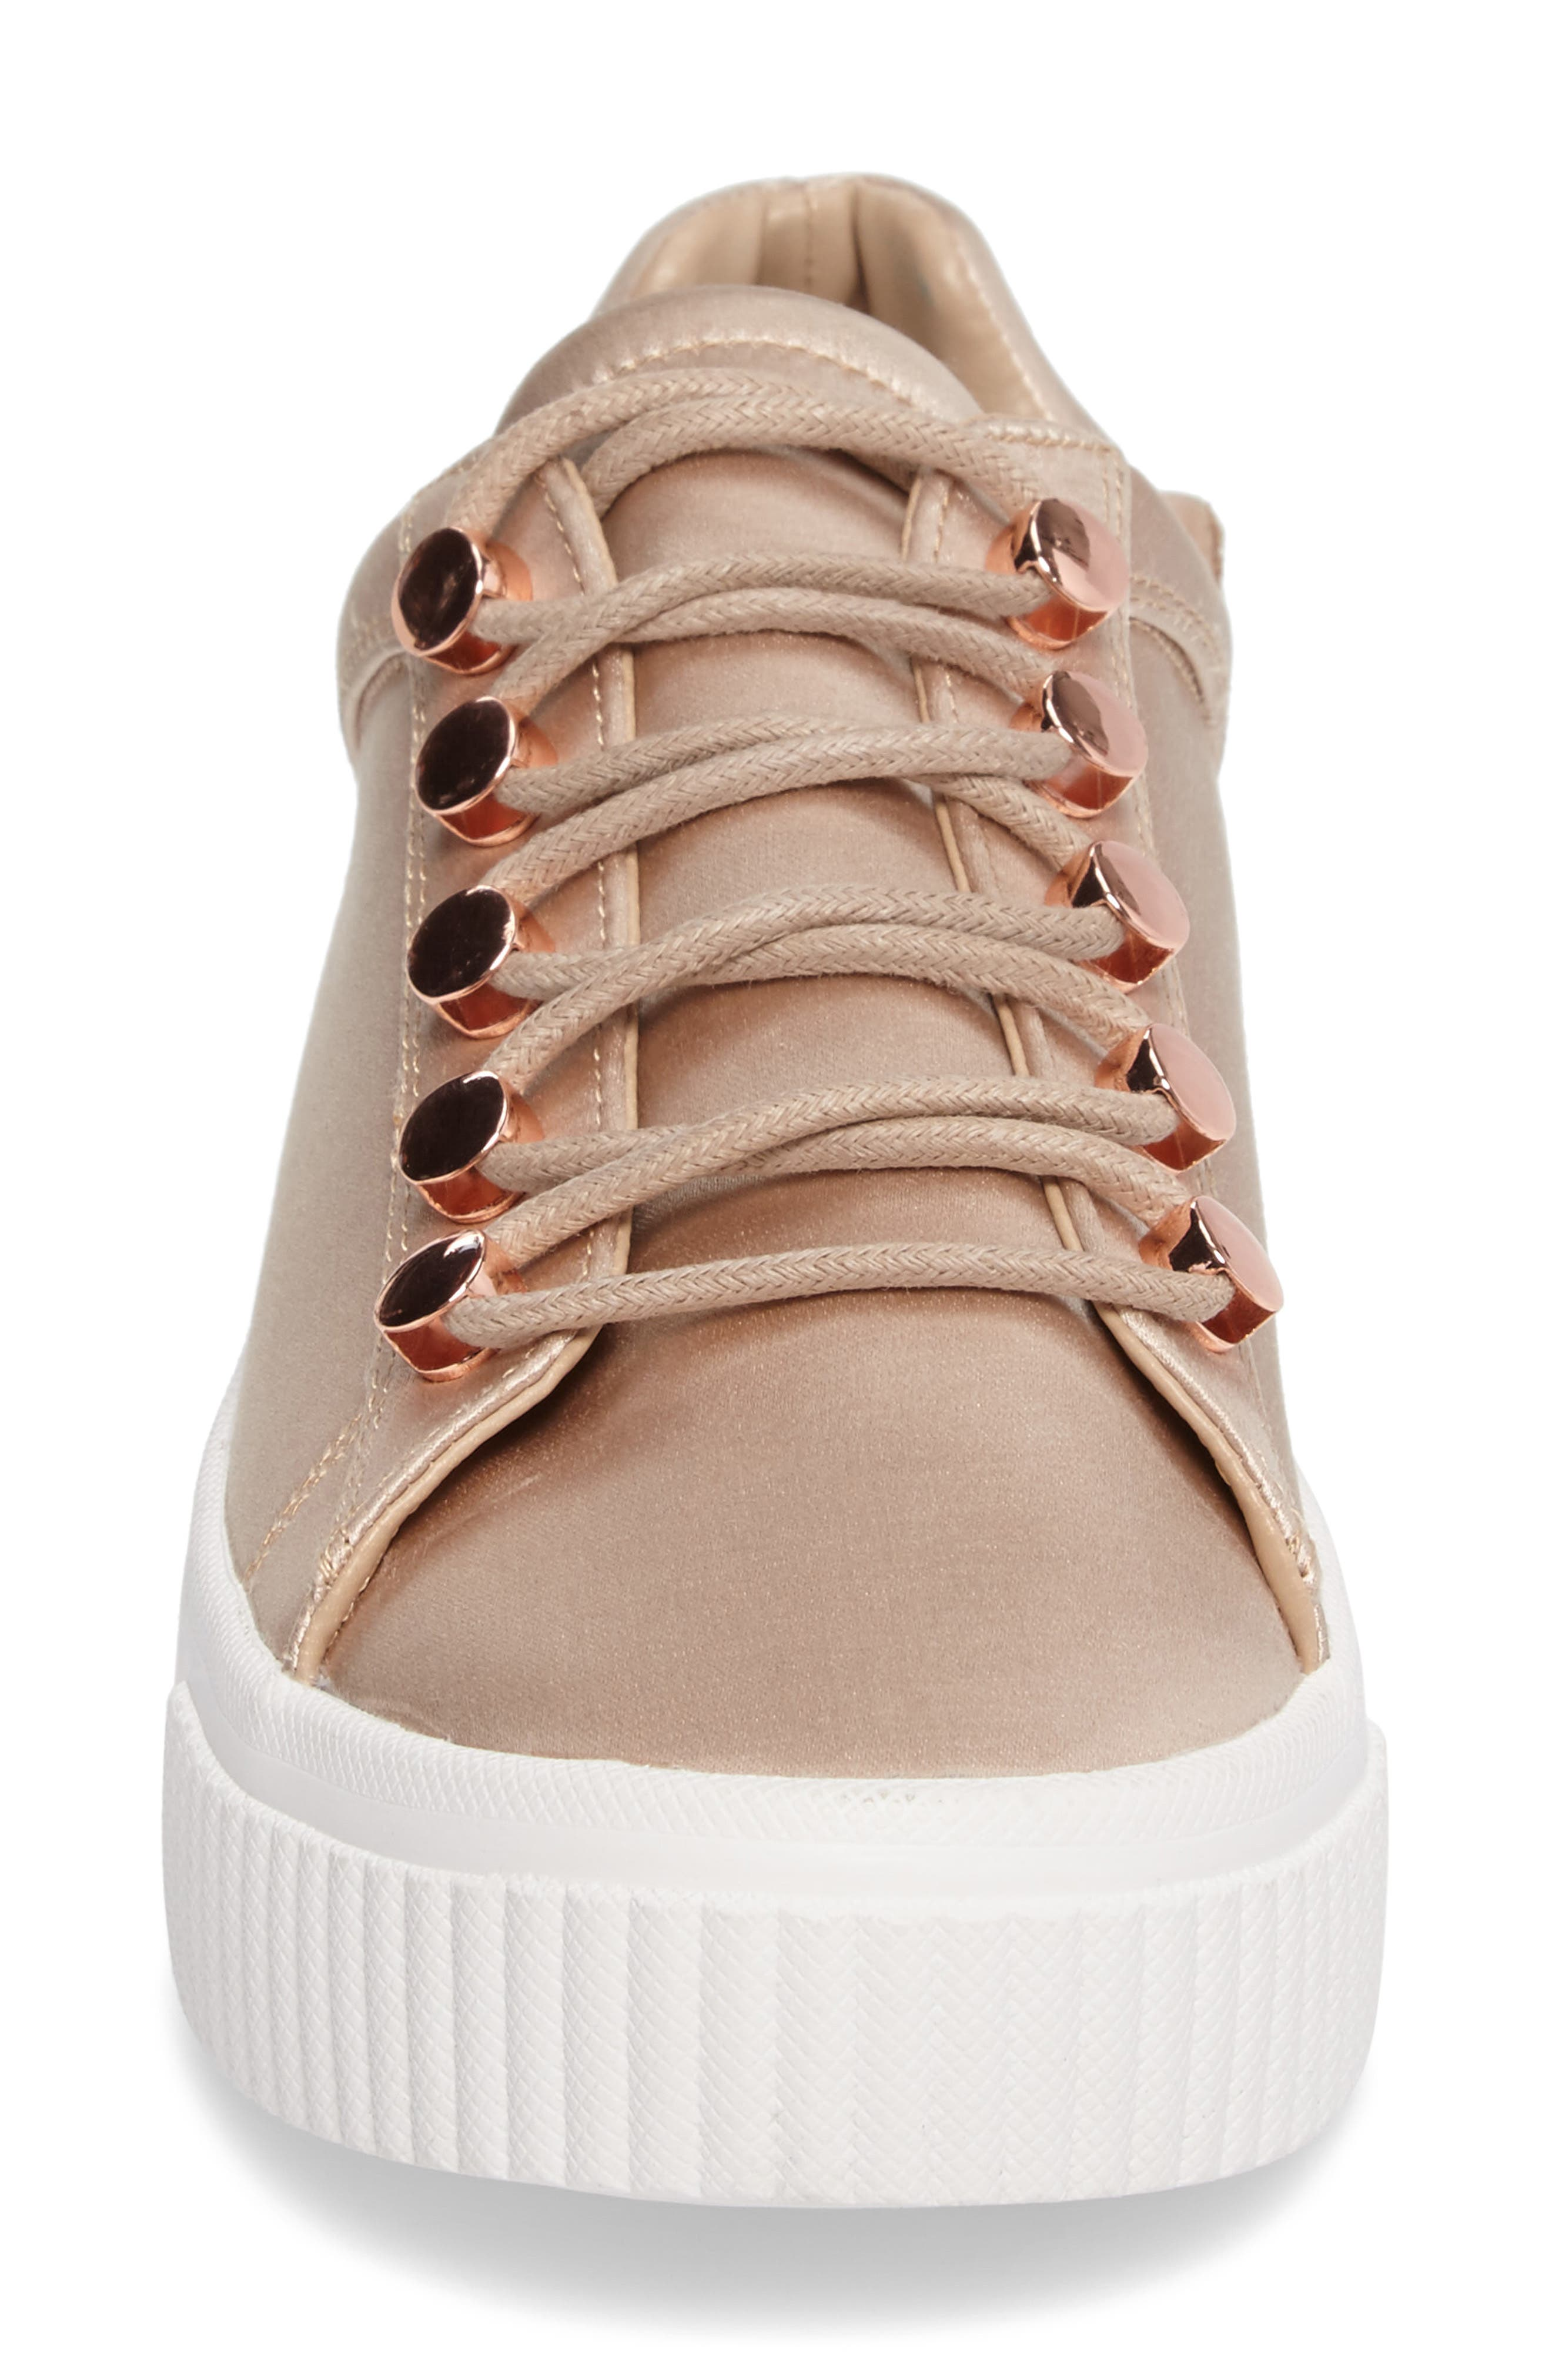 Rae 3 Platform Sneaker,                             Alternate thumbnail 4, color,                             Blush Satin